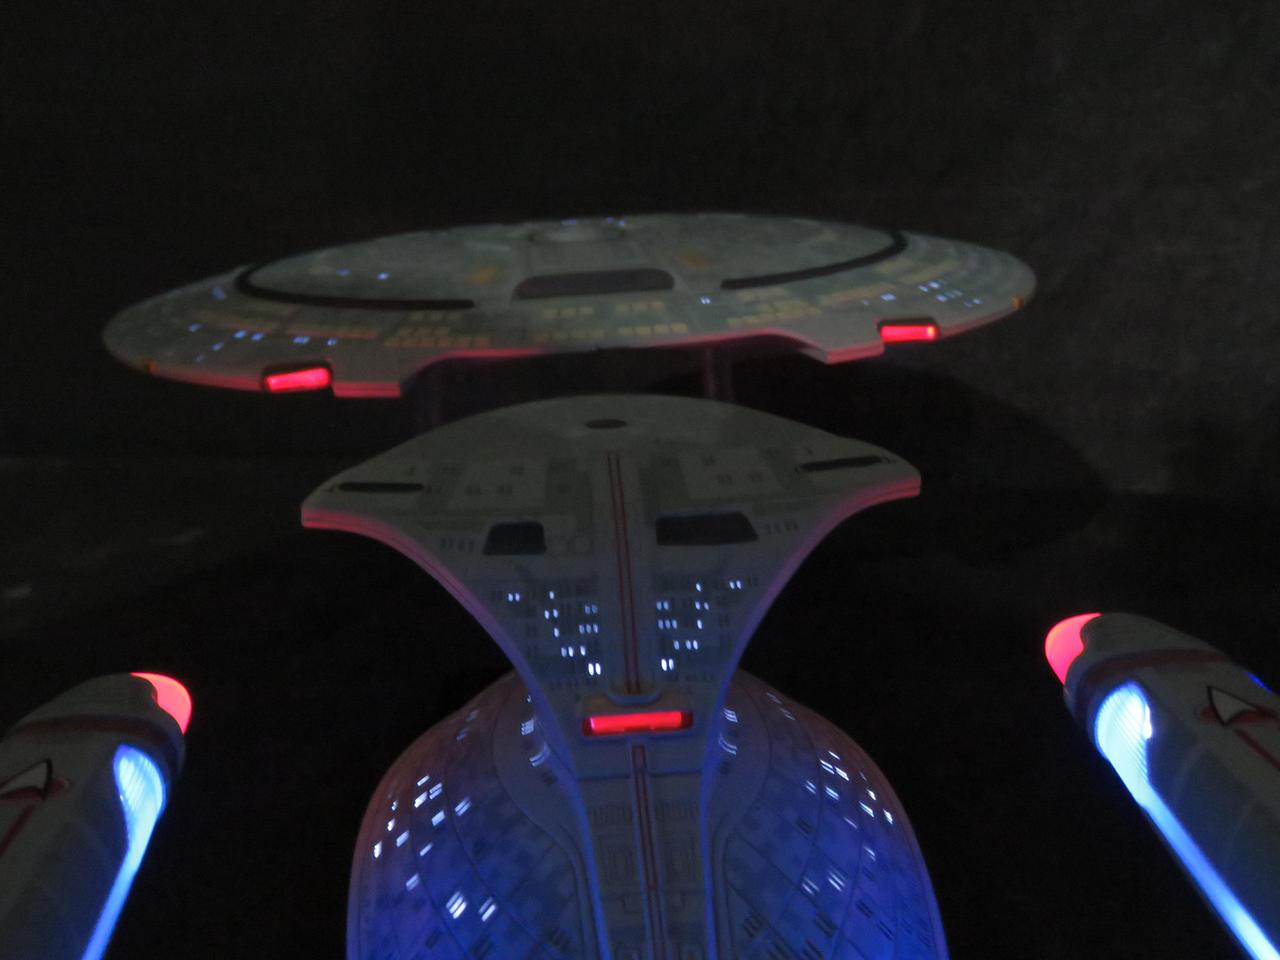 USS ENTERPRISE NCC-1701-D by imranbecks